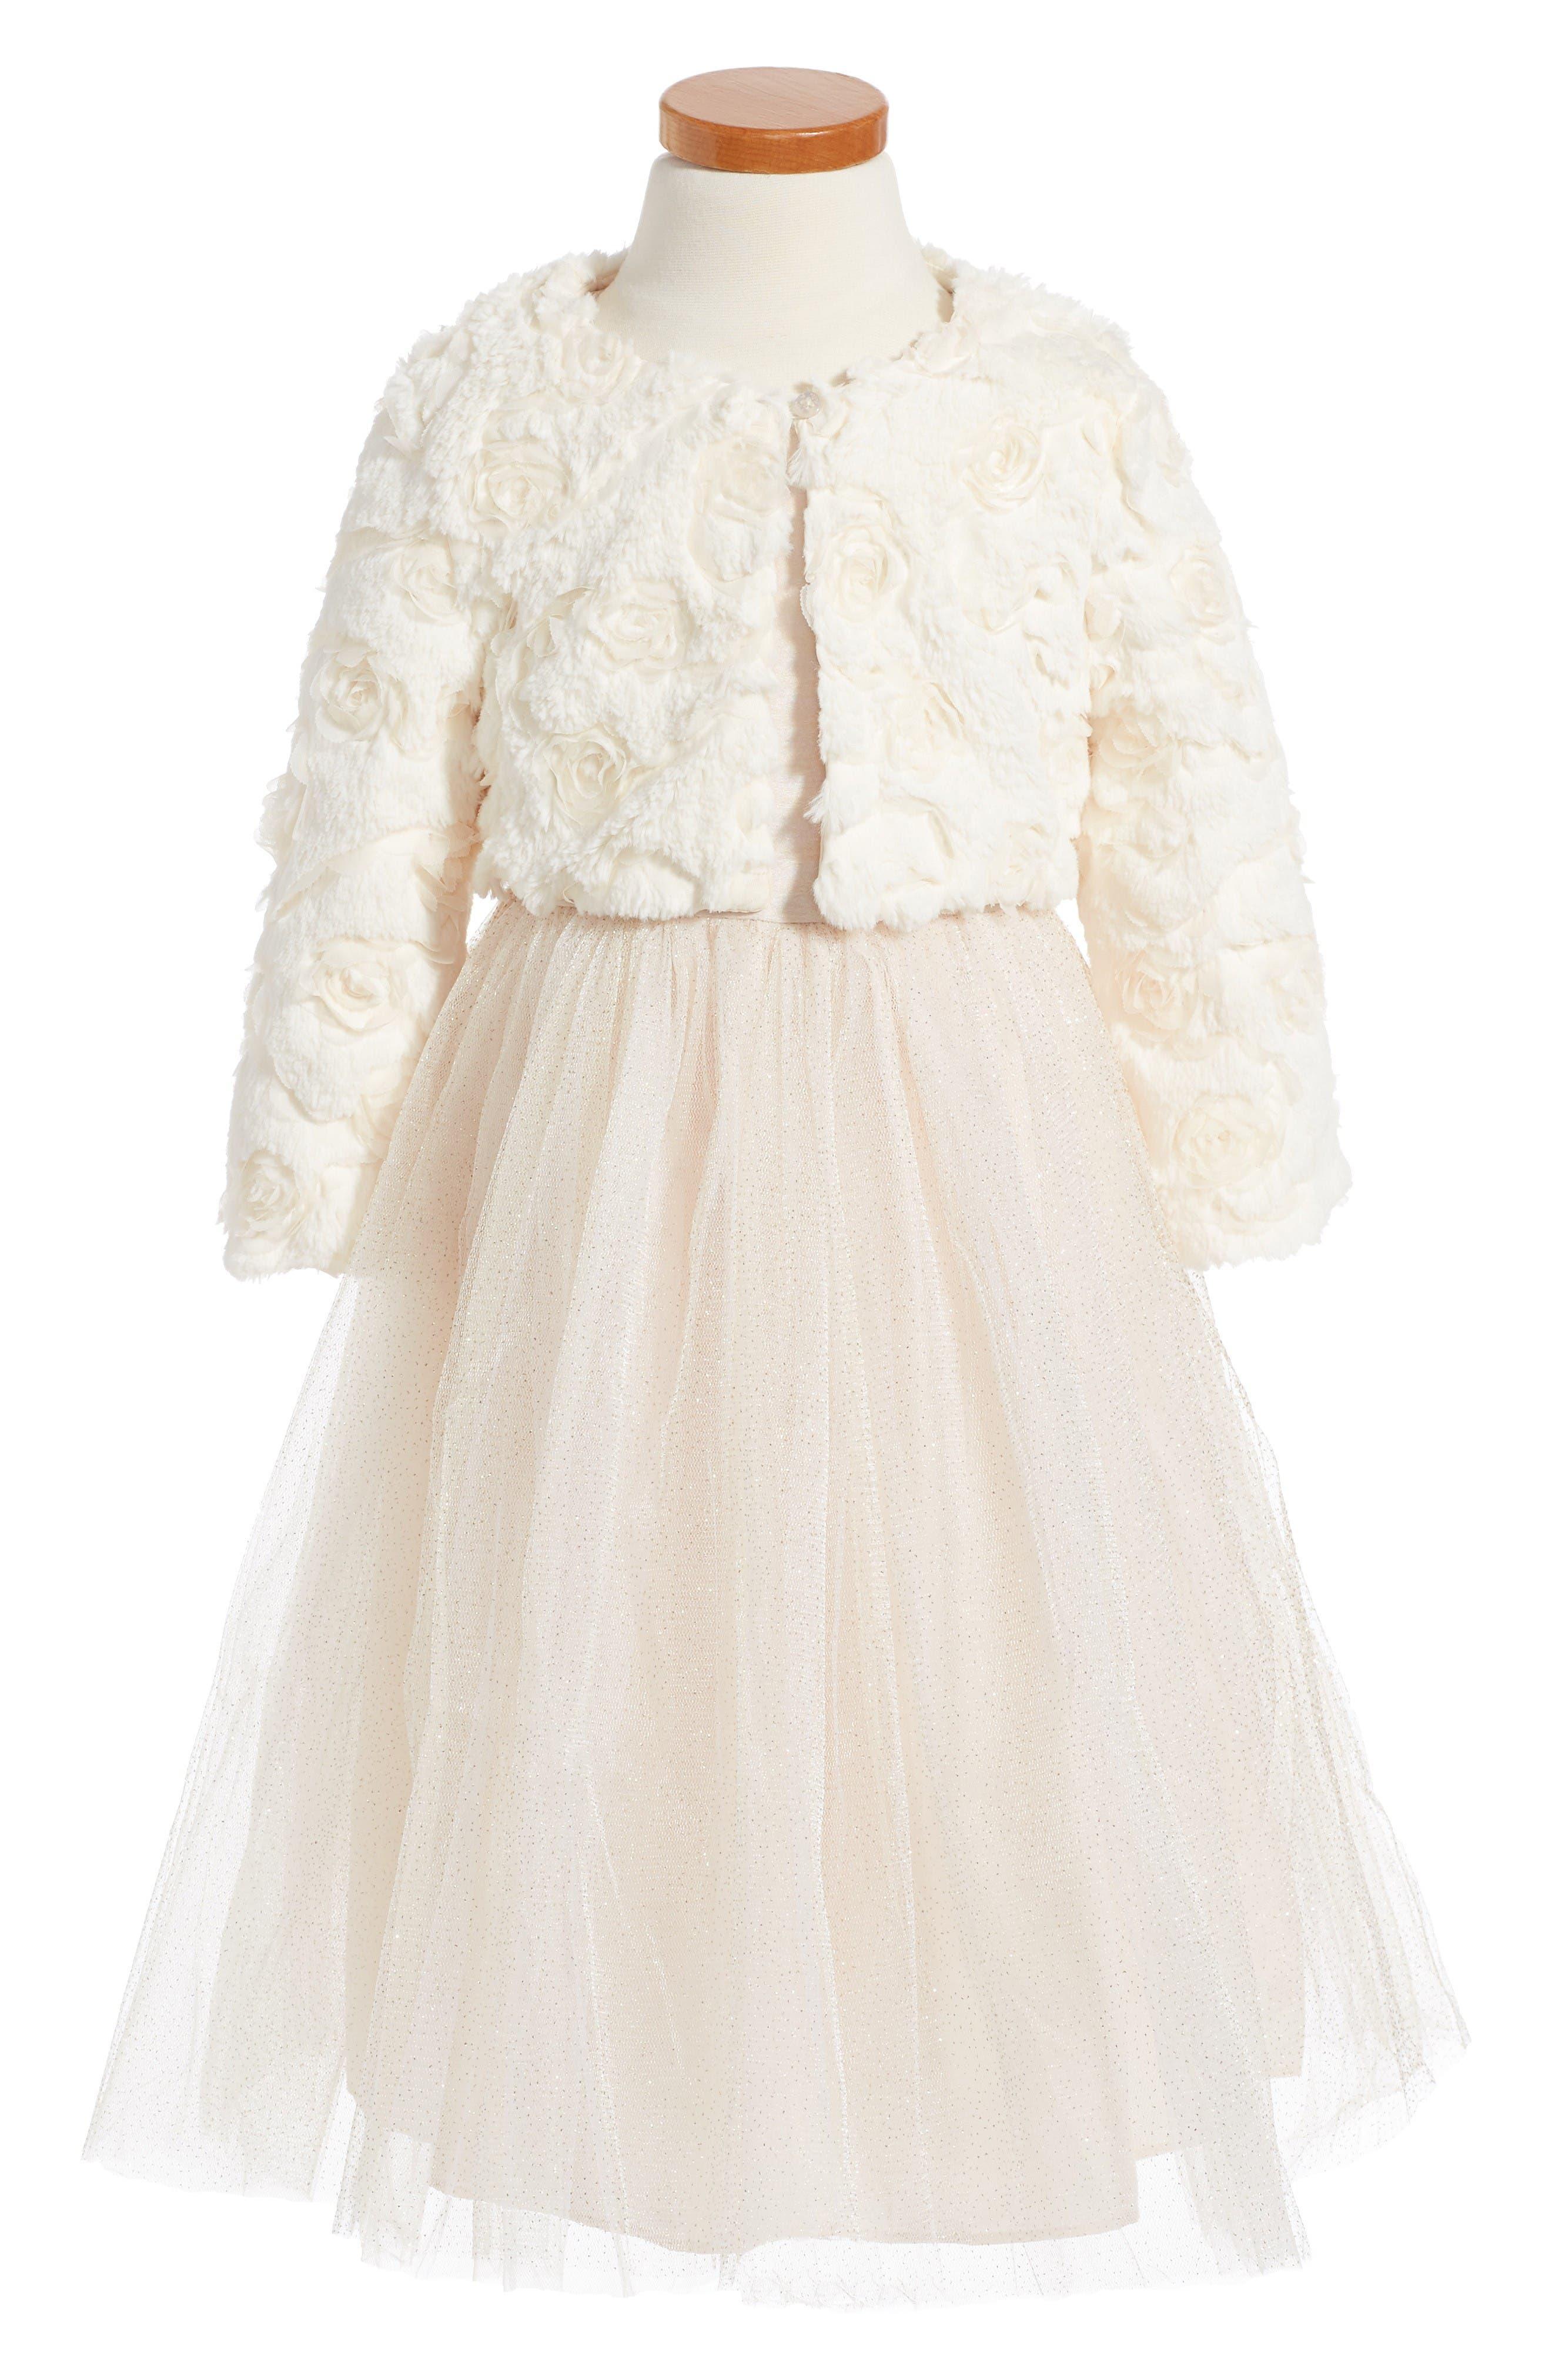 Alternate Image 1 Selected - Pippa & Julie Tulle Dress & Rosette Faux Fur Jacket (Toddler Girls, Little Girls & Big Girls)